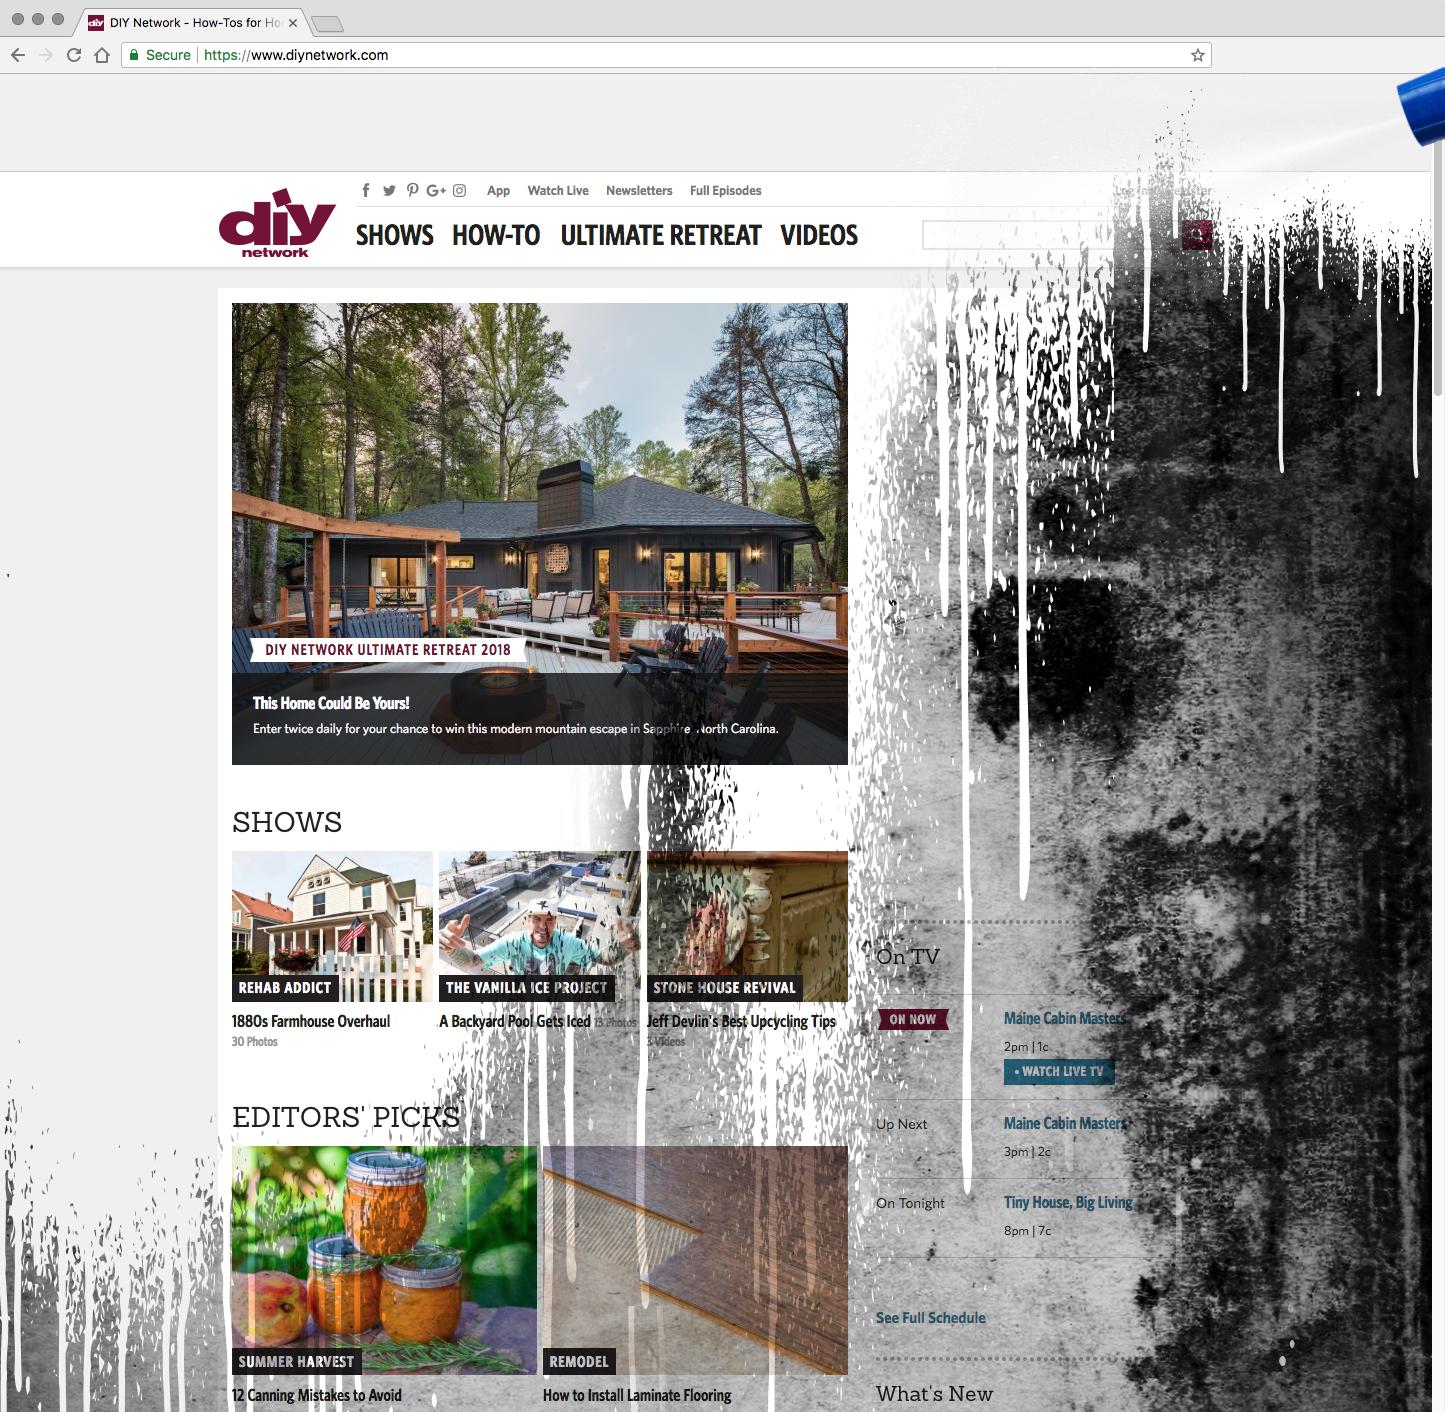 Digitial_Takeover_Frame5.jpg